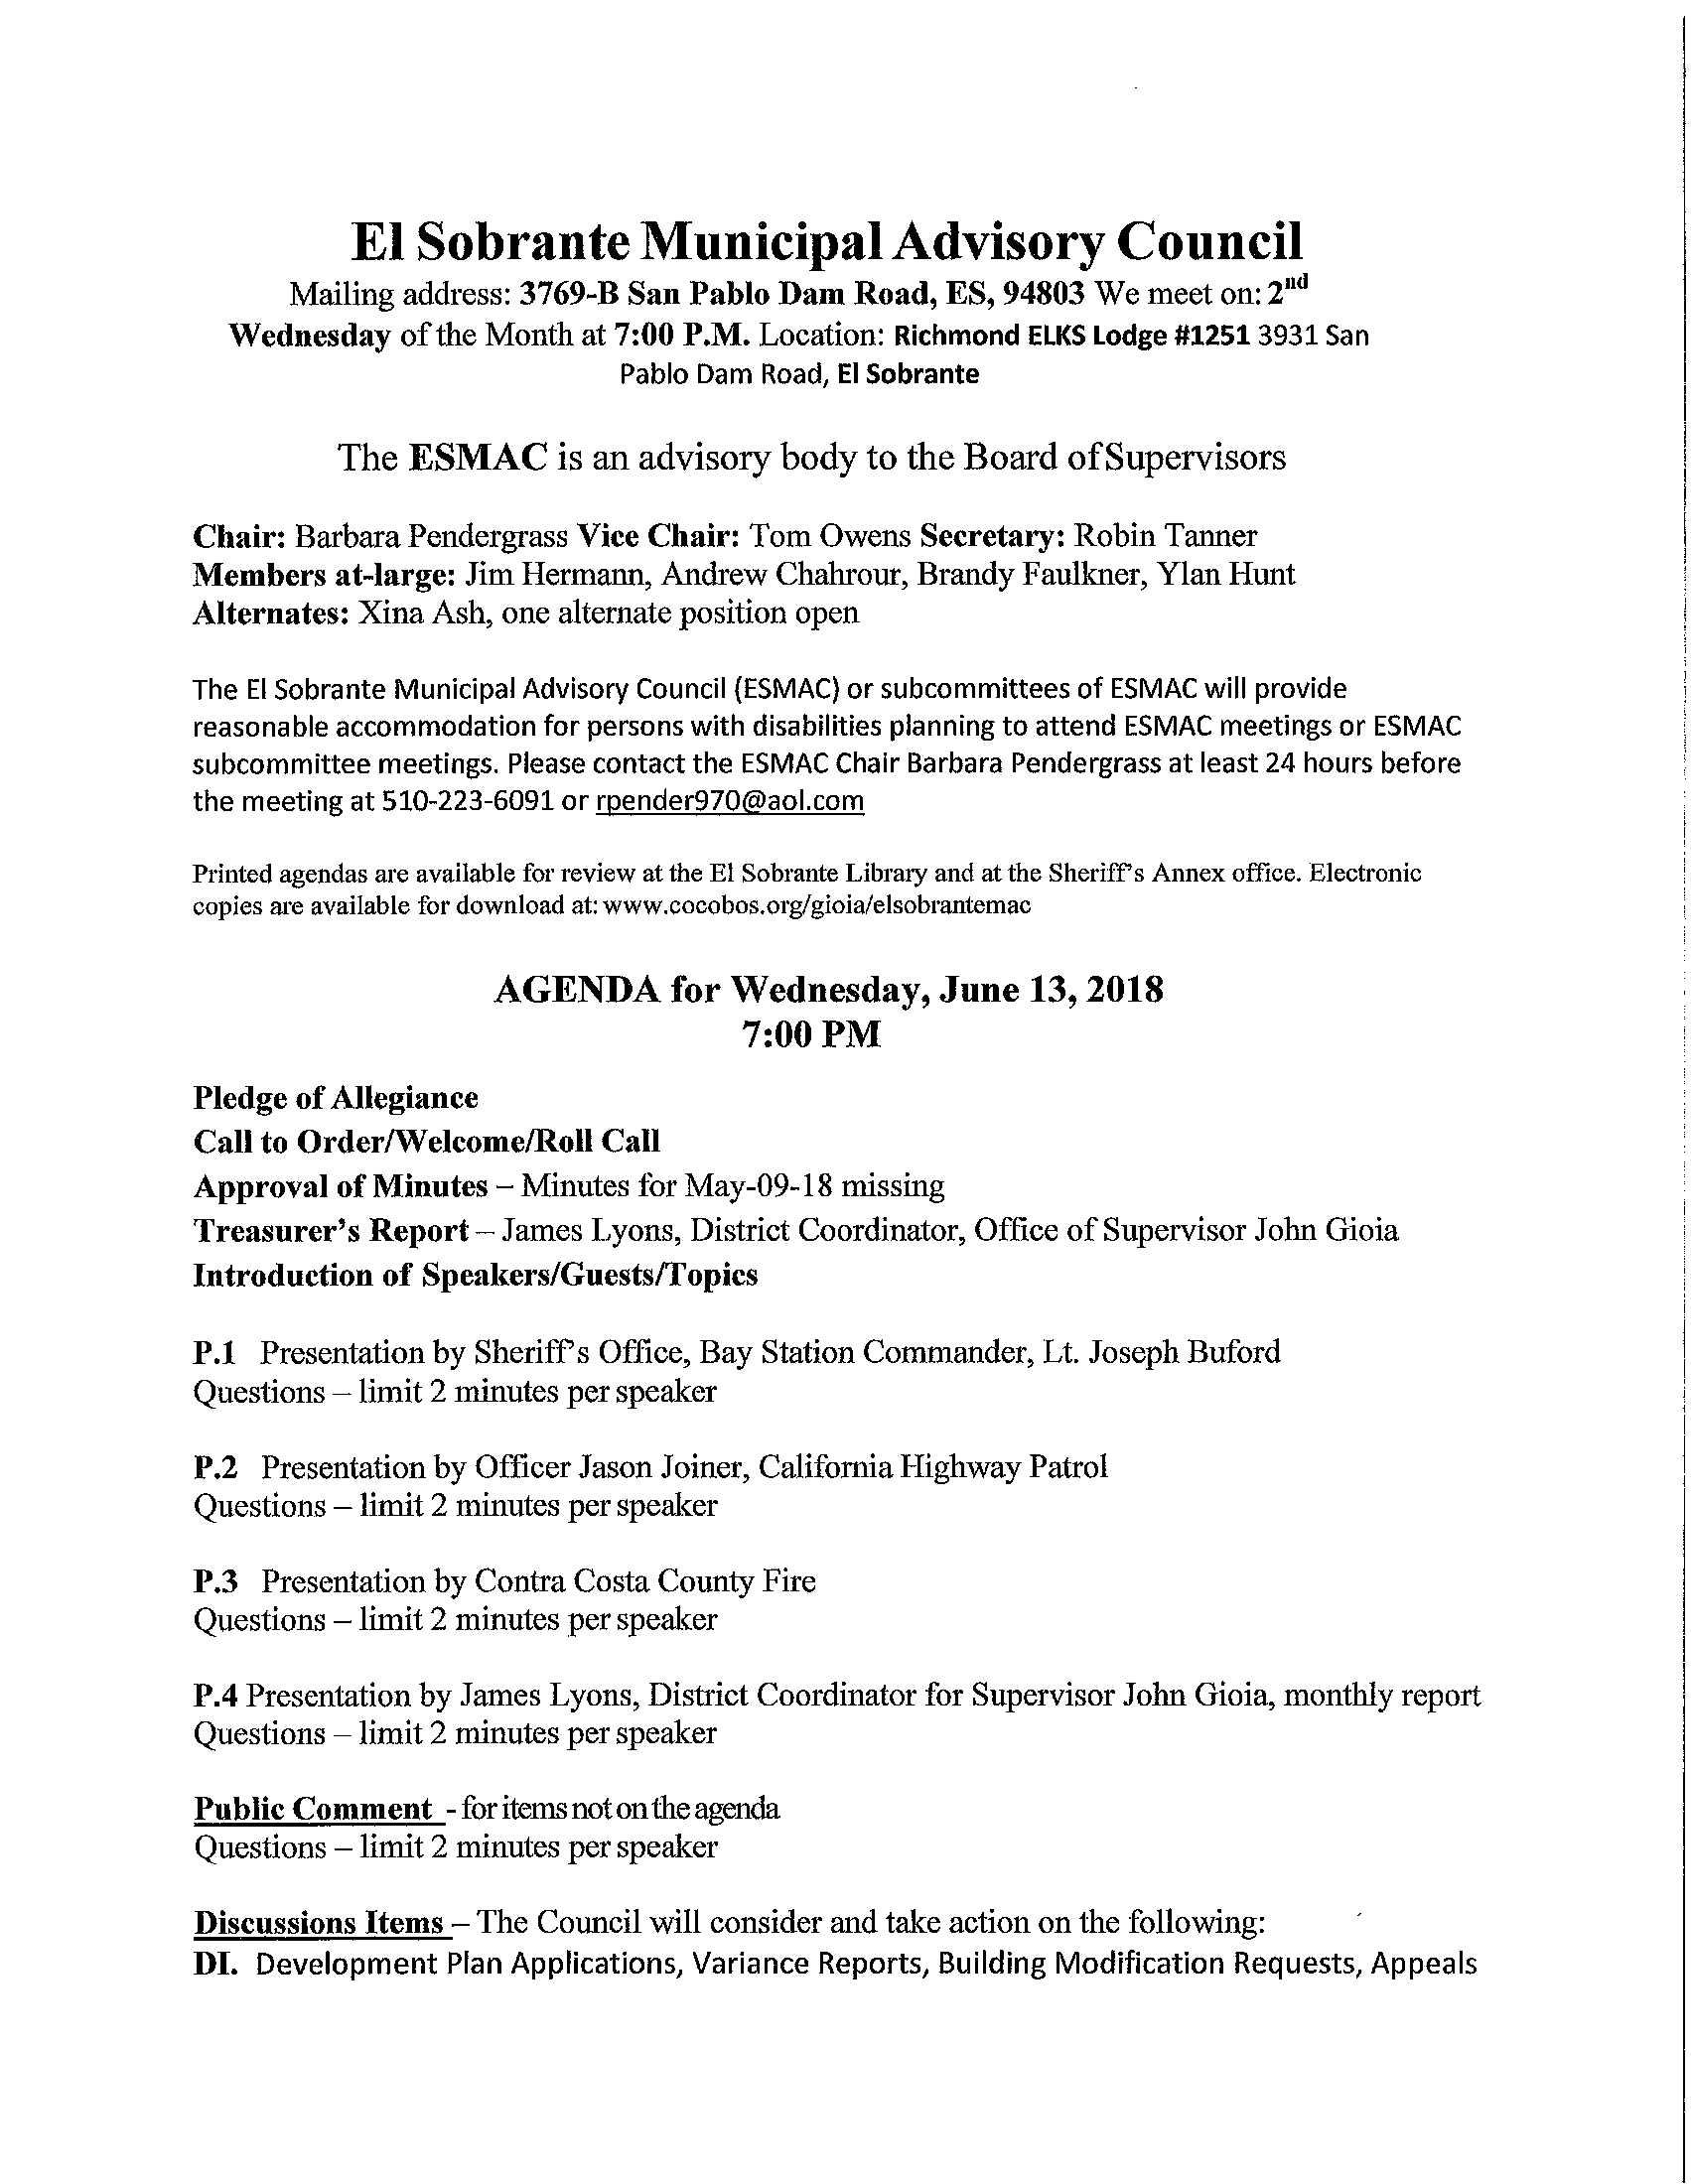 ESMAC Agenda 6.13.2018 (30 Pages)_1.jpg